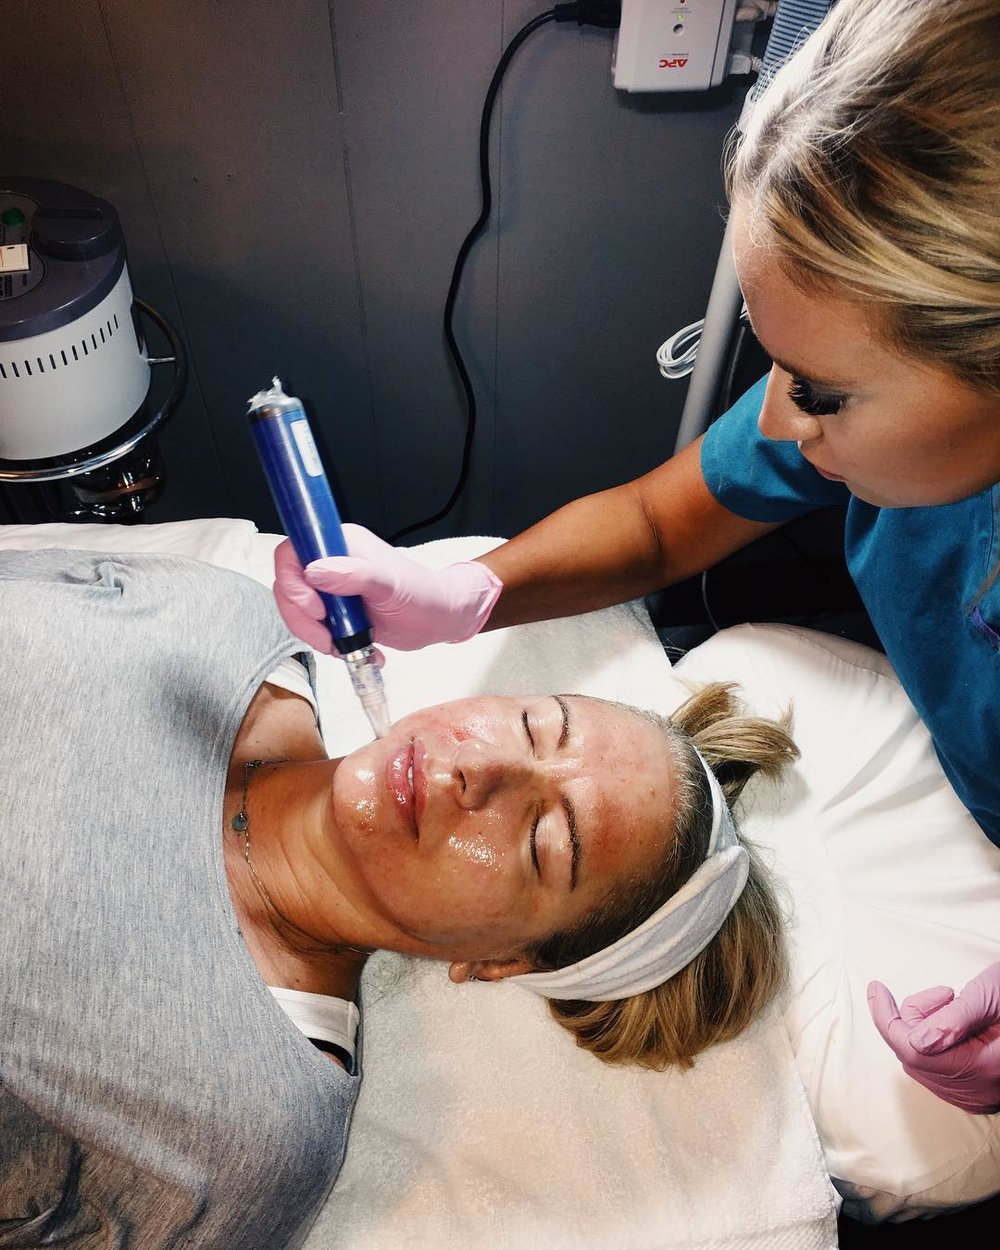 Microneedling - Botox Dysport Juvederm Restylane by Skin Envy MD Nashville.jpg